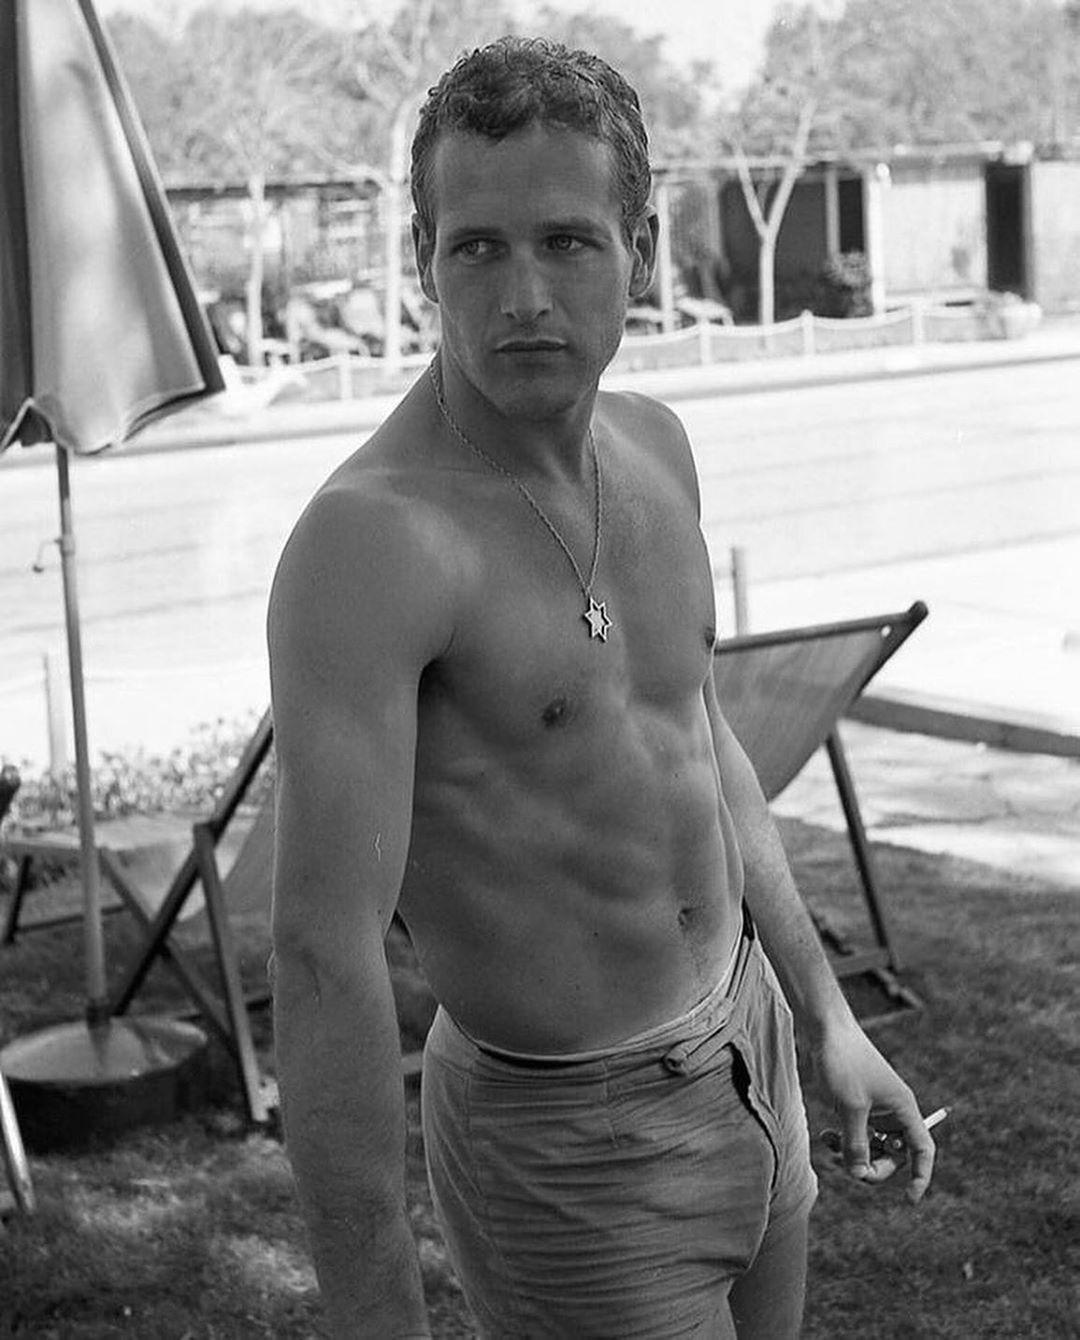 The Paul Newman Look | Paul newman, Actors, Cine